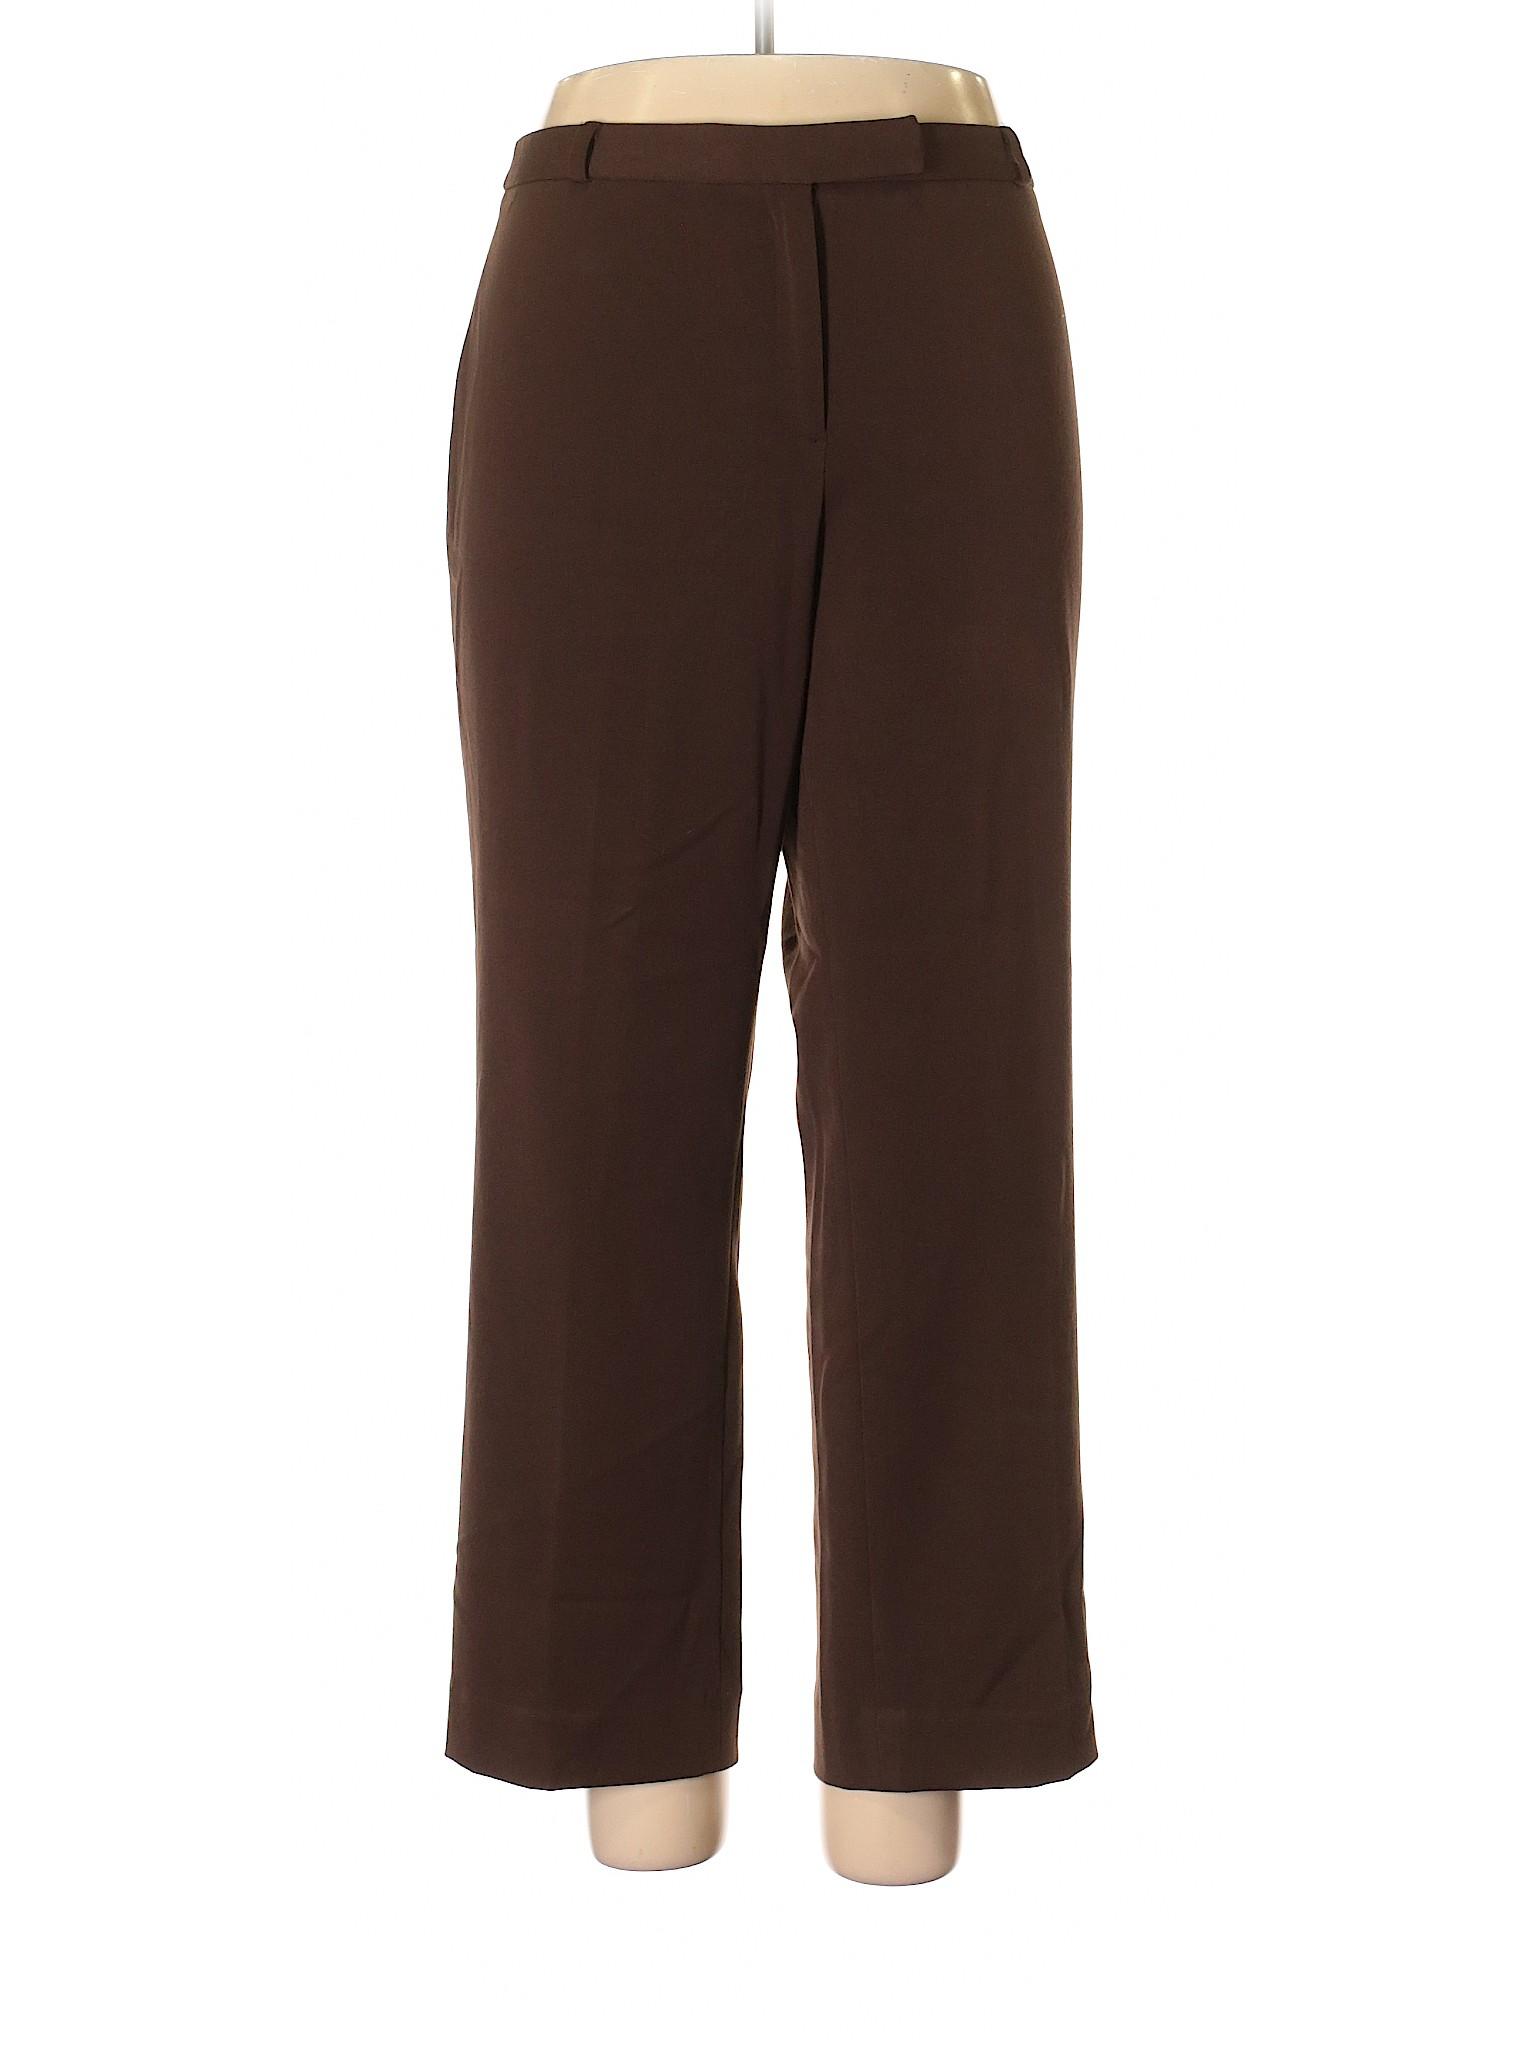 Charter winter Dress Boutique Pants Club YxzAT